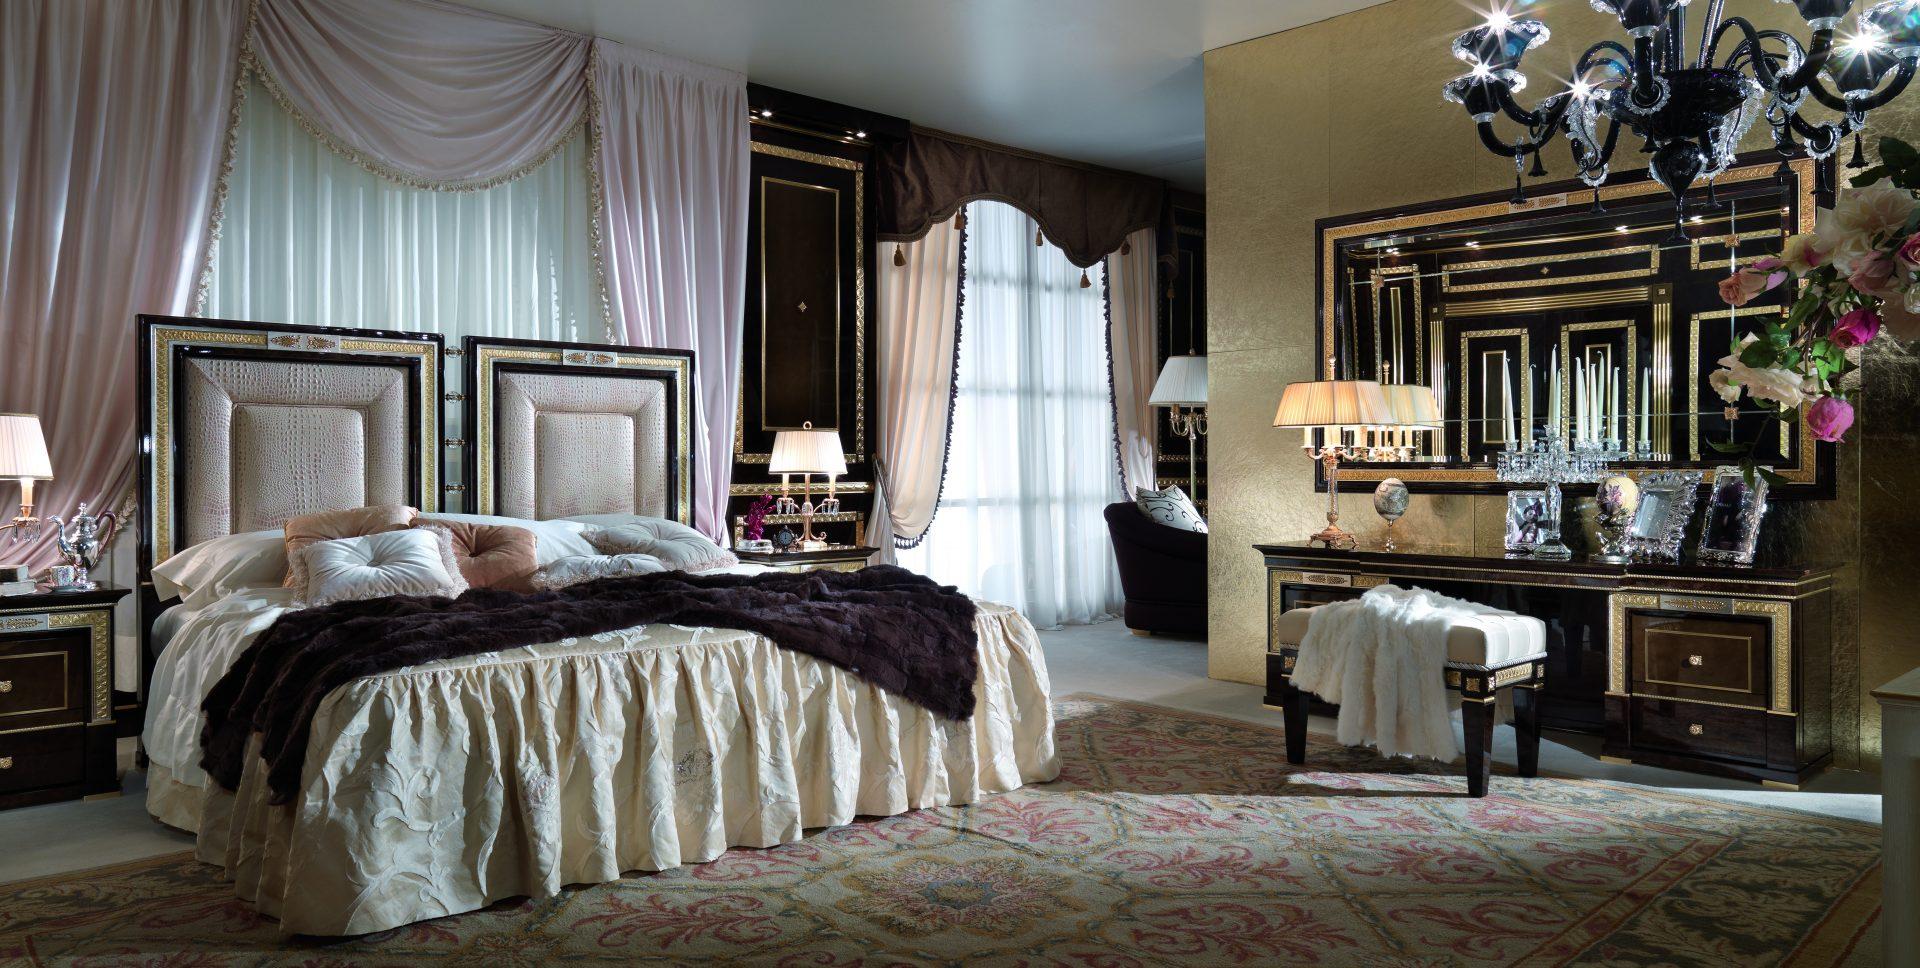 Arcade Royale Bed